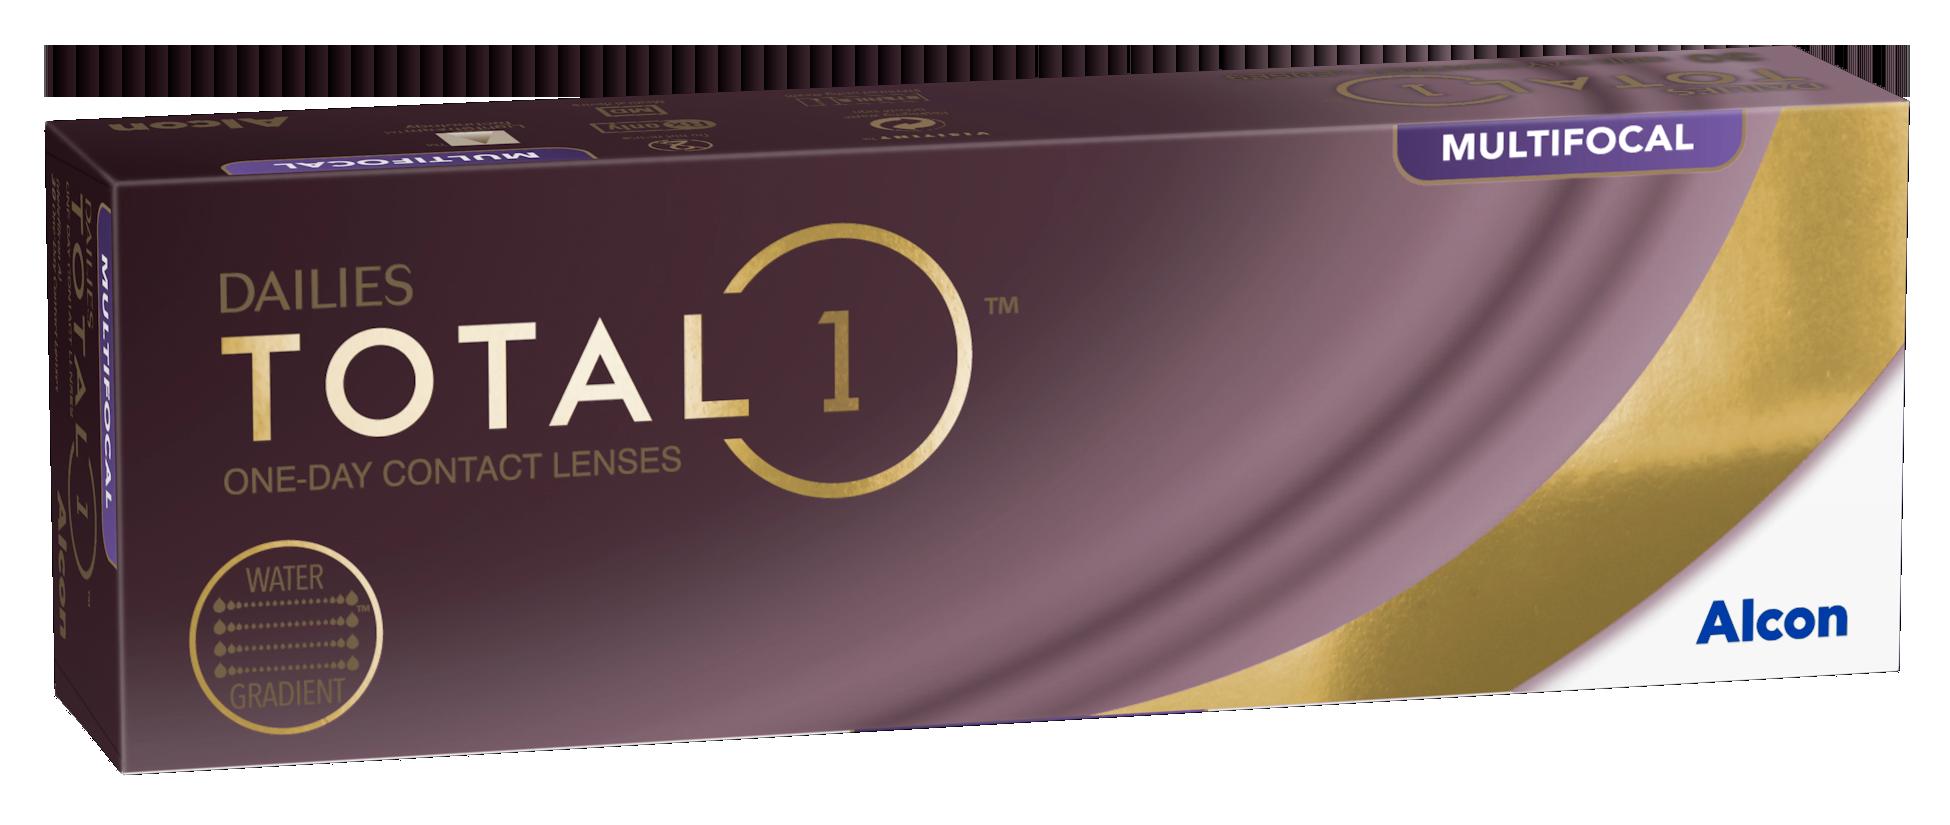 Dailies Total 1 Multifocal, Alcon (30 Stk.)